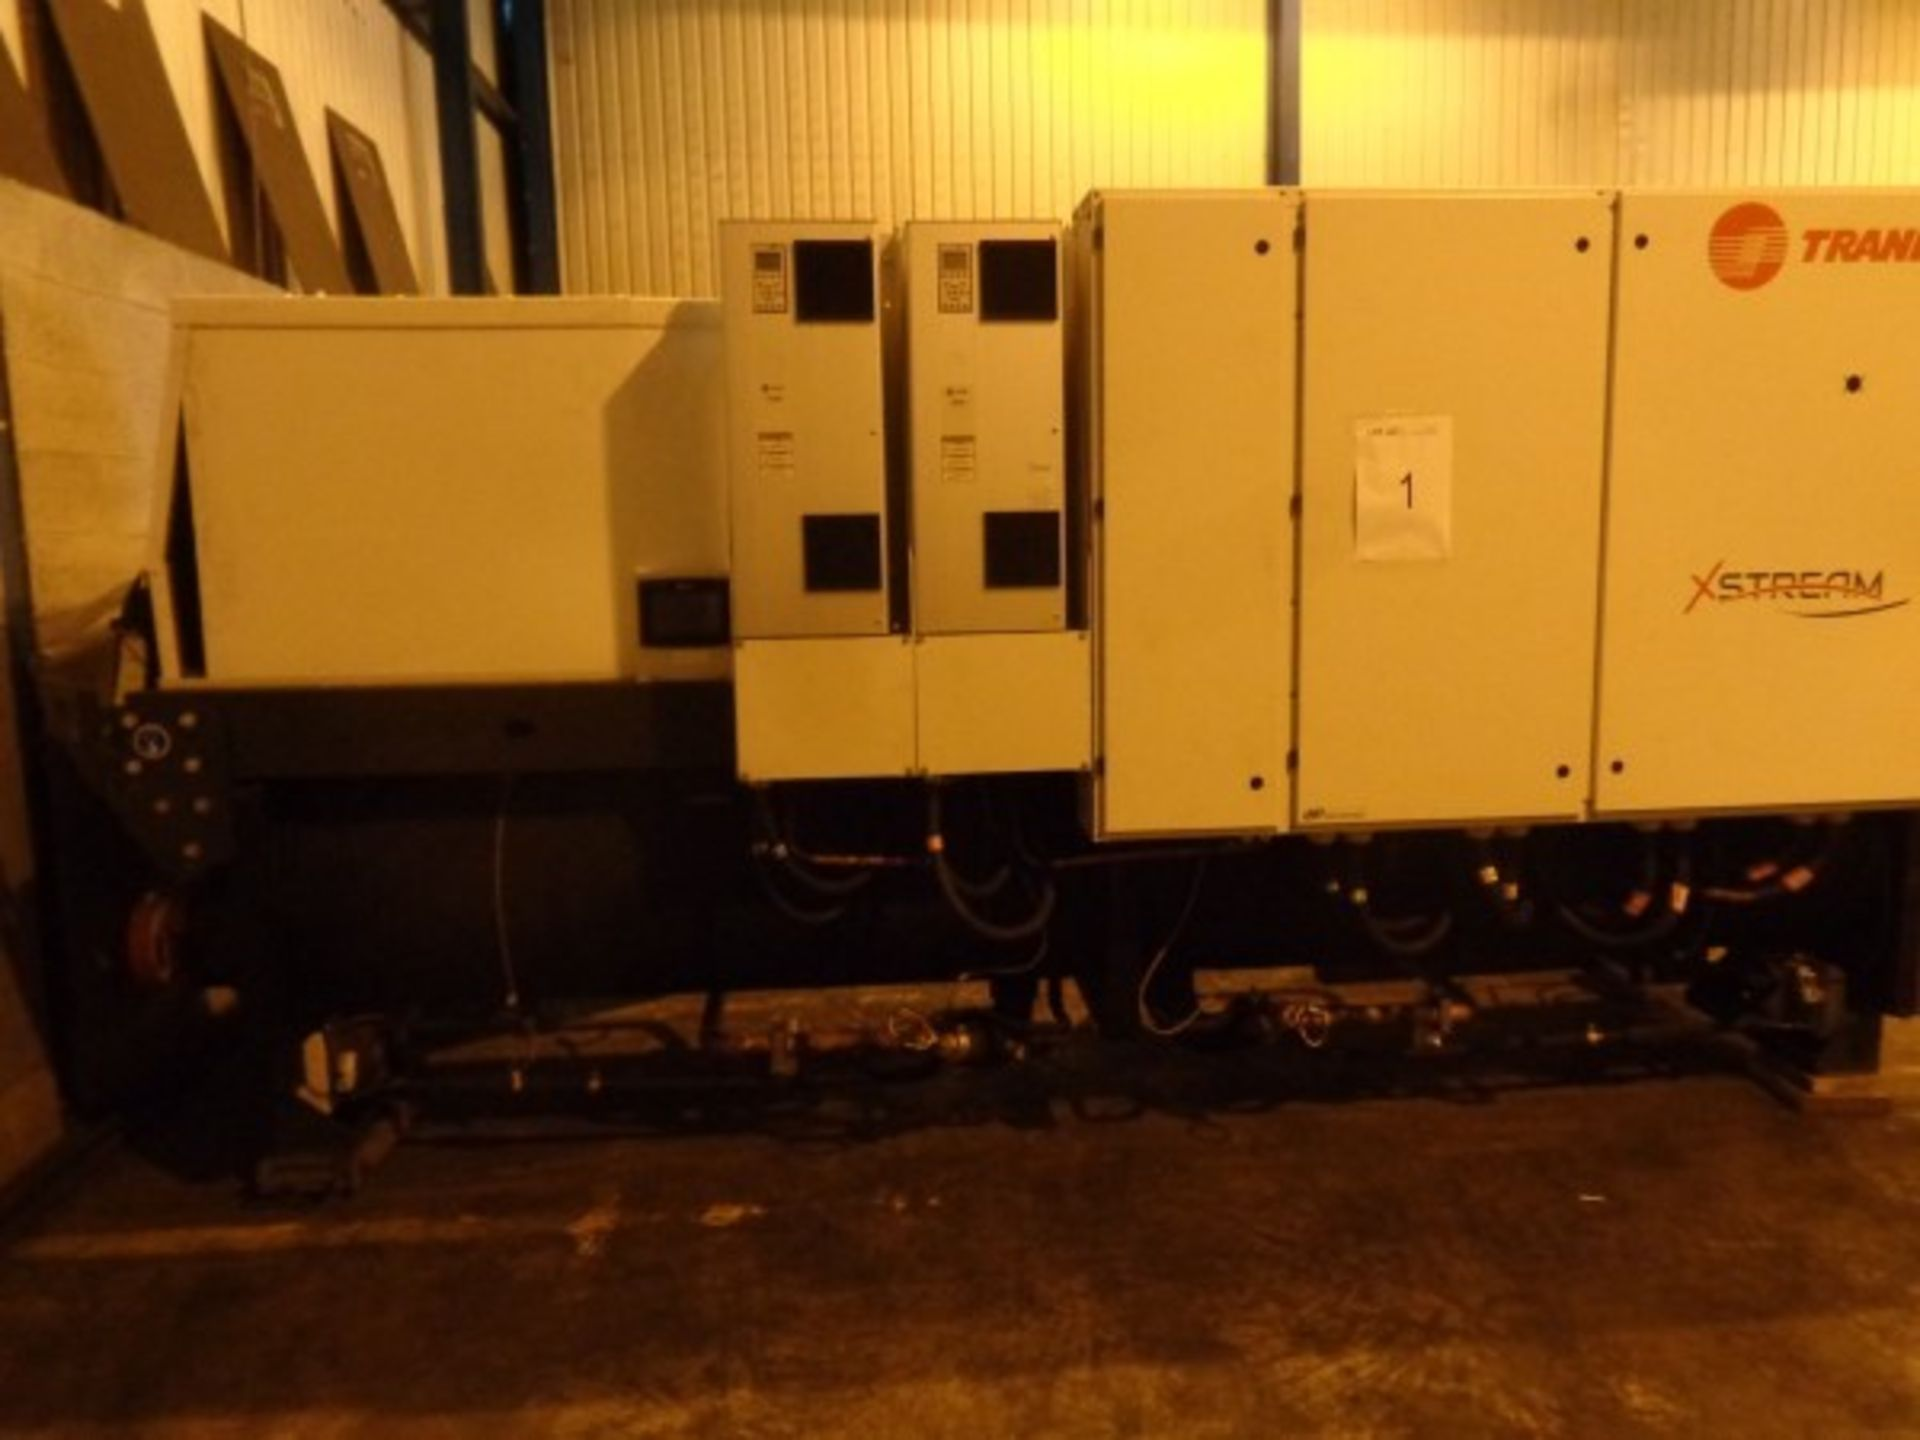 Trane Type RTWF 360HSE heat pump, serial no. ELB6032, 400V-50 HZ-3PH, 928 A Maz, 35KA-ICC-LRA,